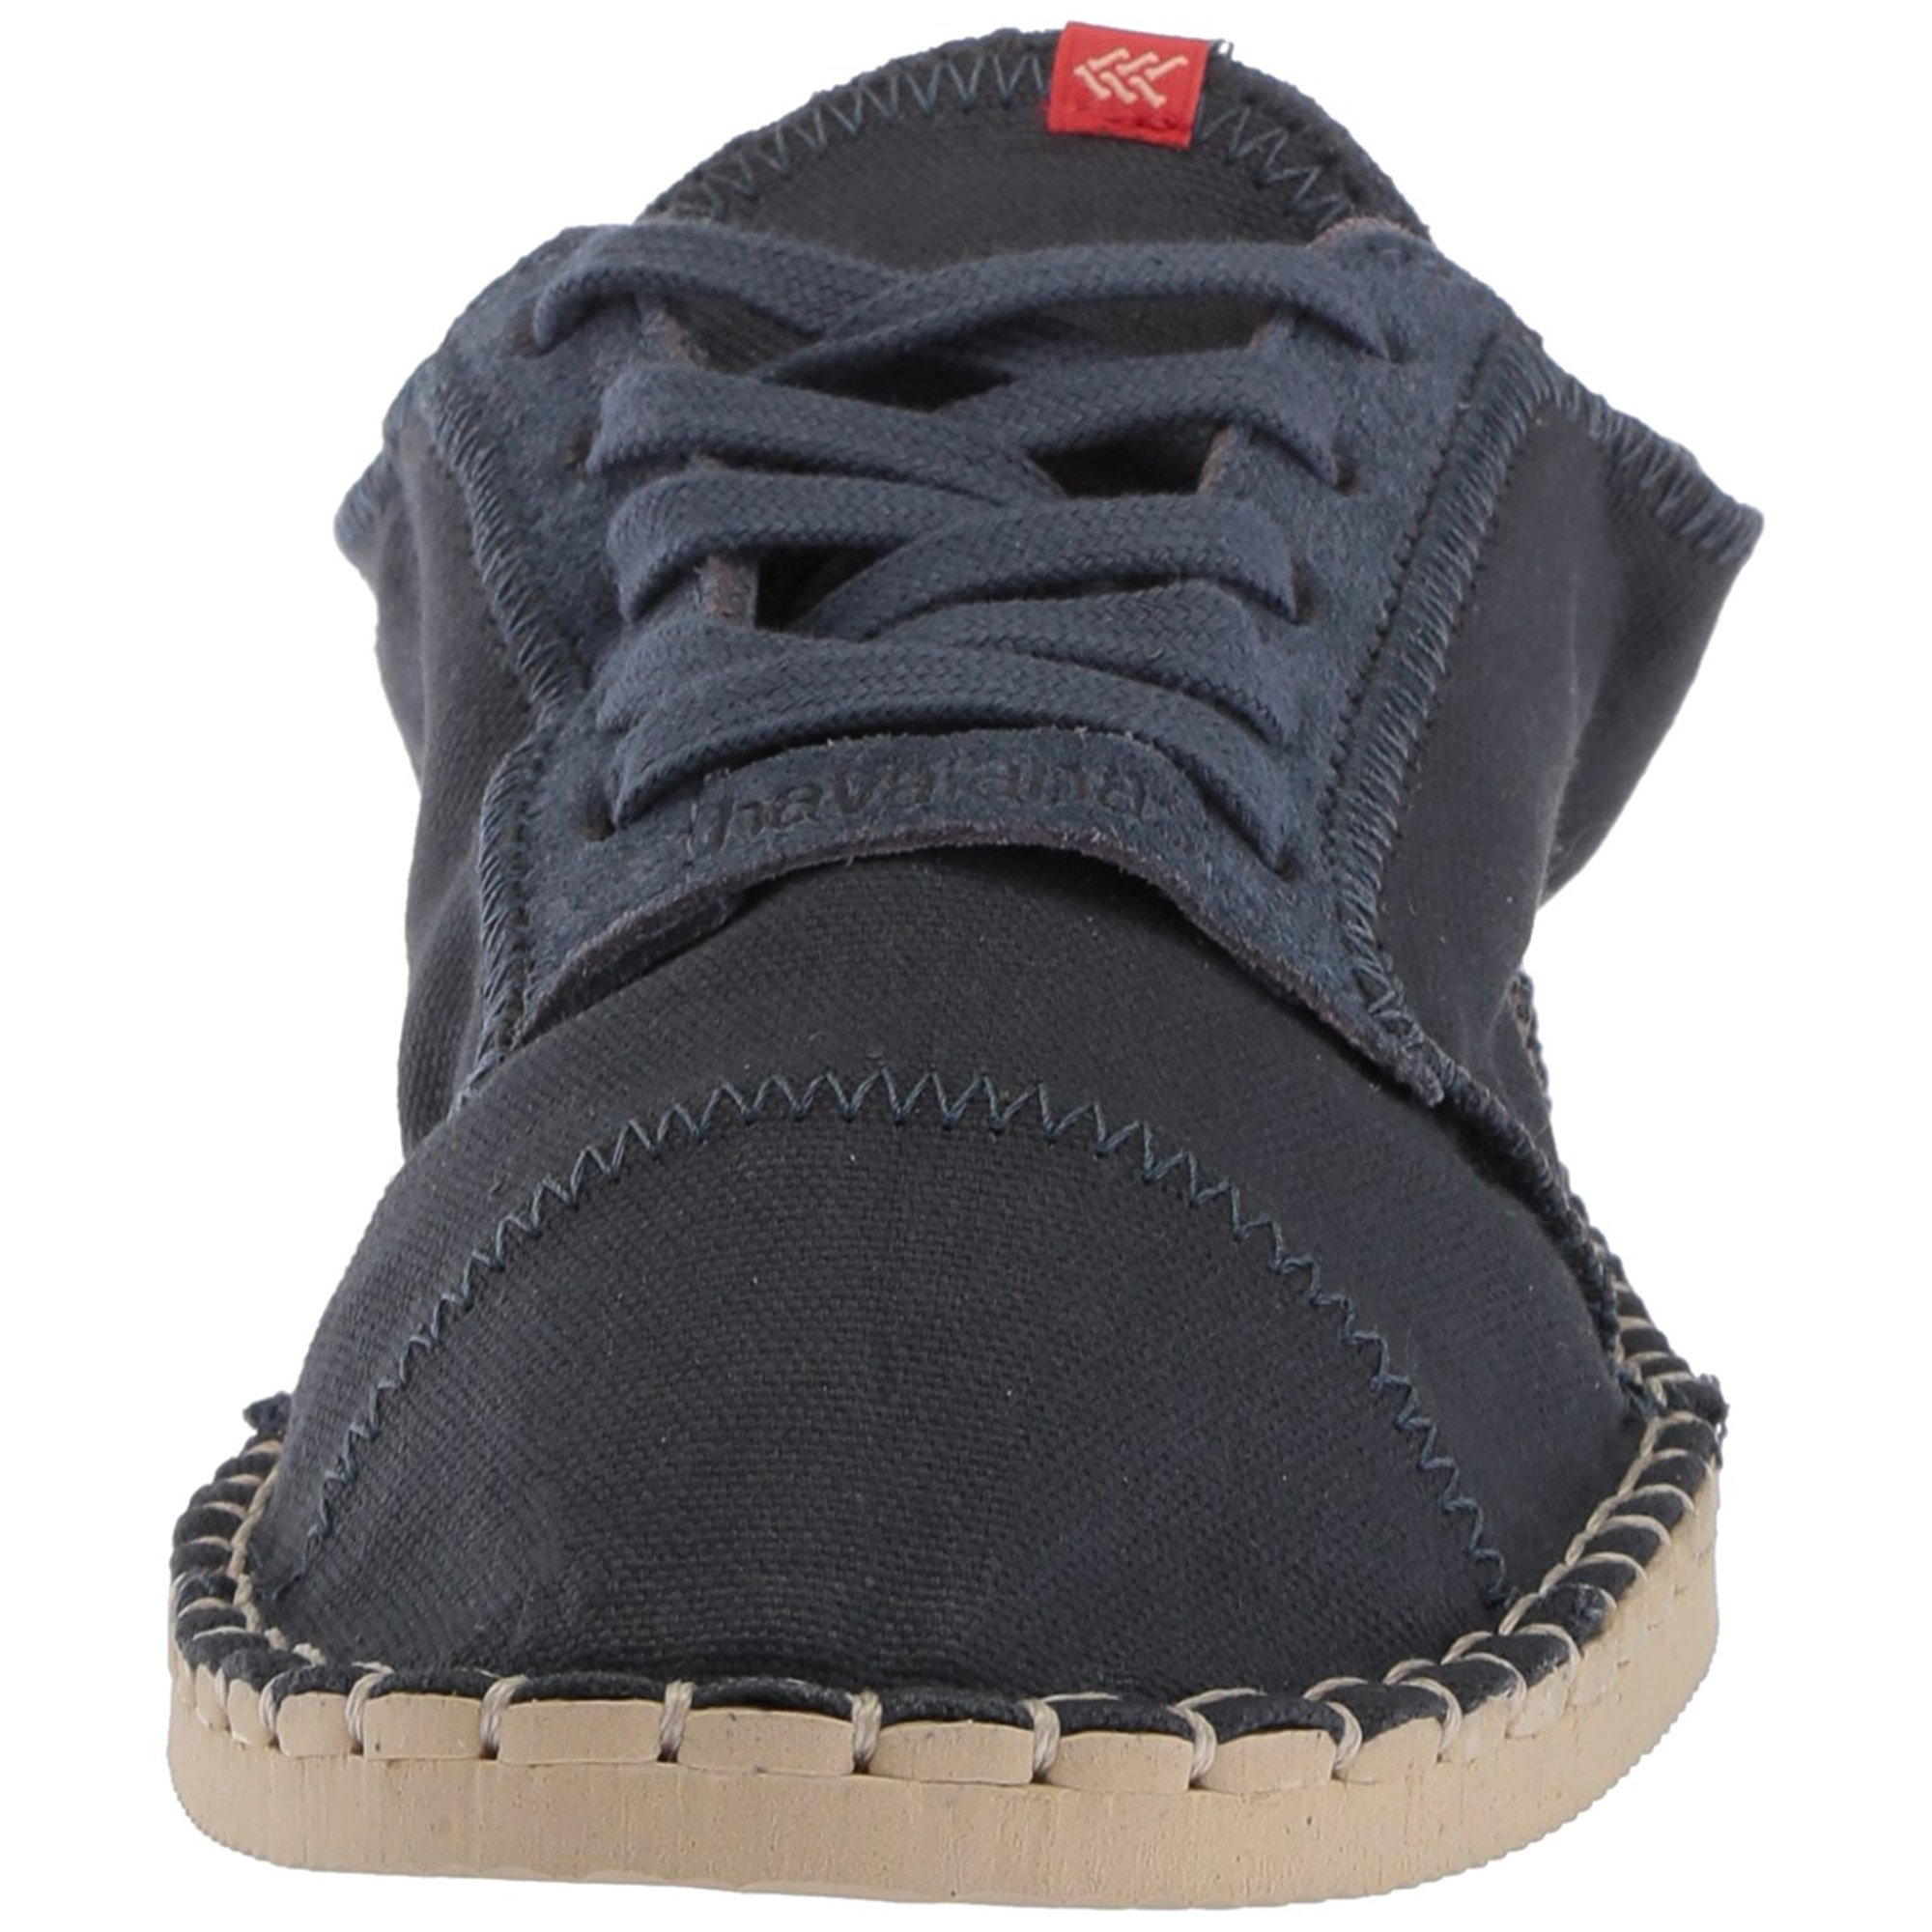 759cf0b1cf21 Havaianas Womens Origine Sneaker III Espadrille Canvas Low Top ...